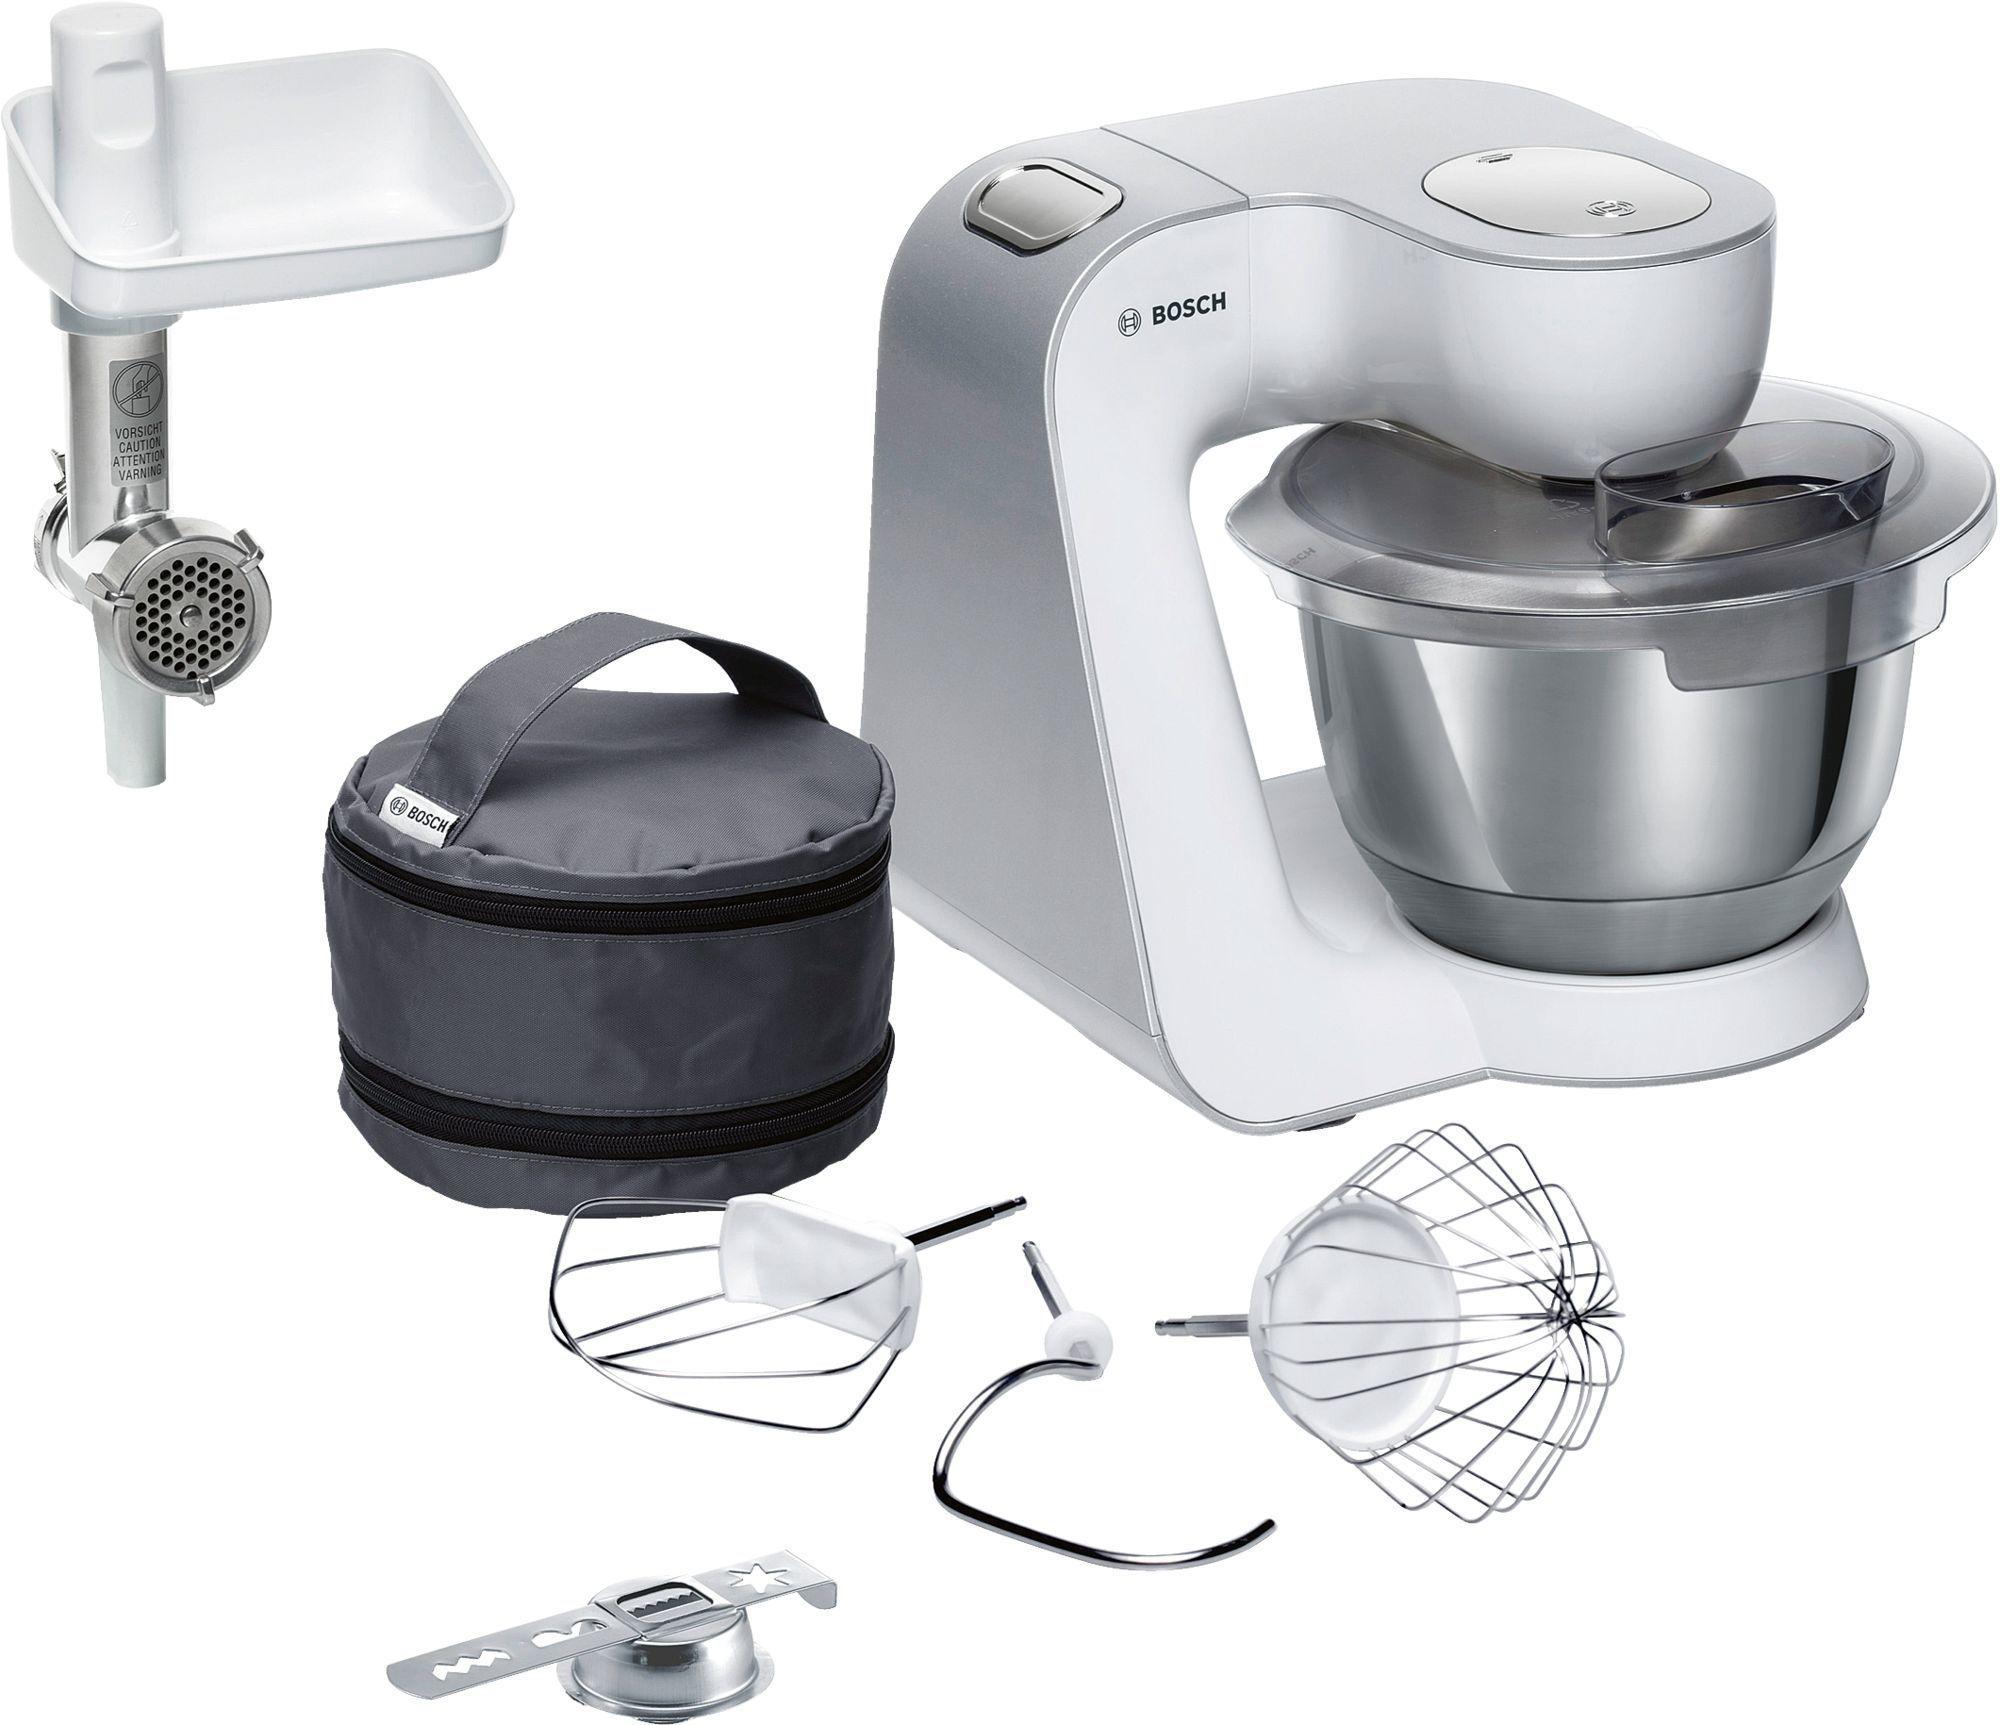 Кухонные комбайны BOSCH – купить кухонный комбайн Bosch (Бош), цены, отзывы